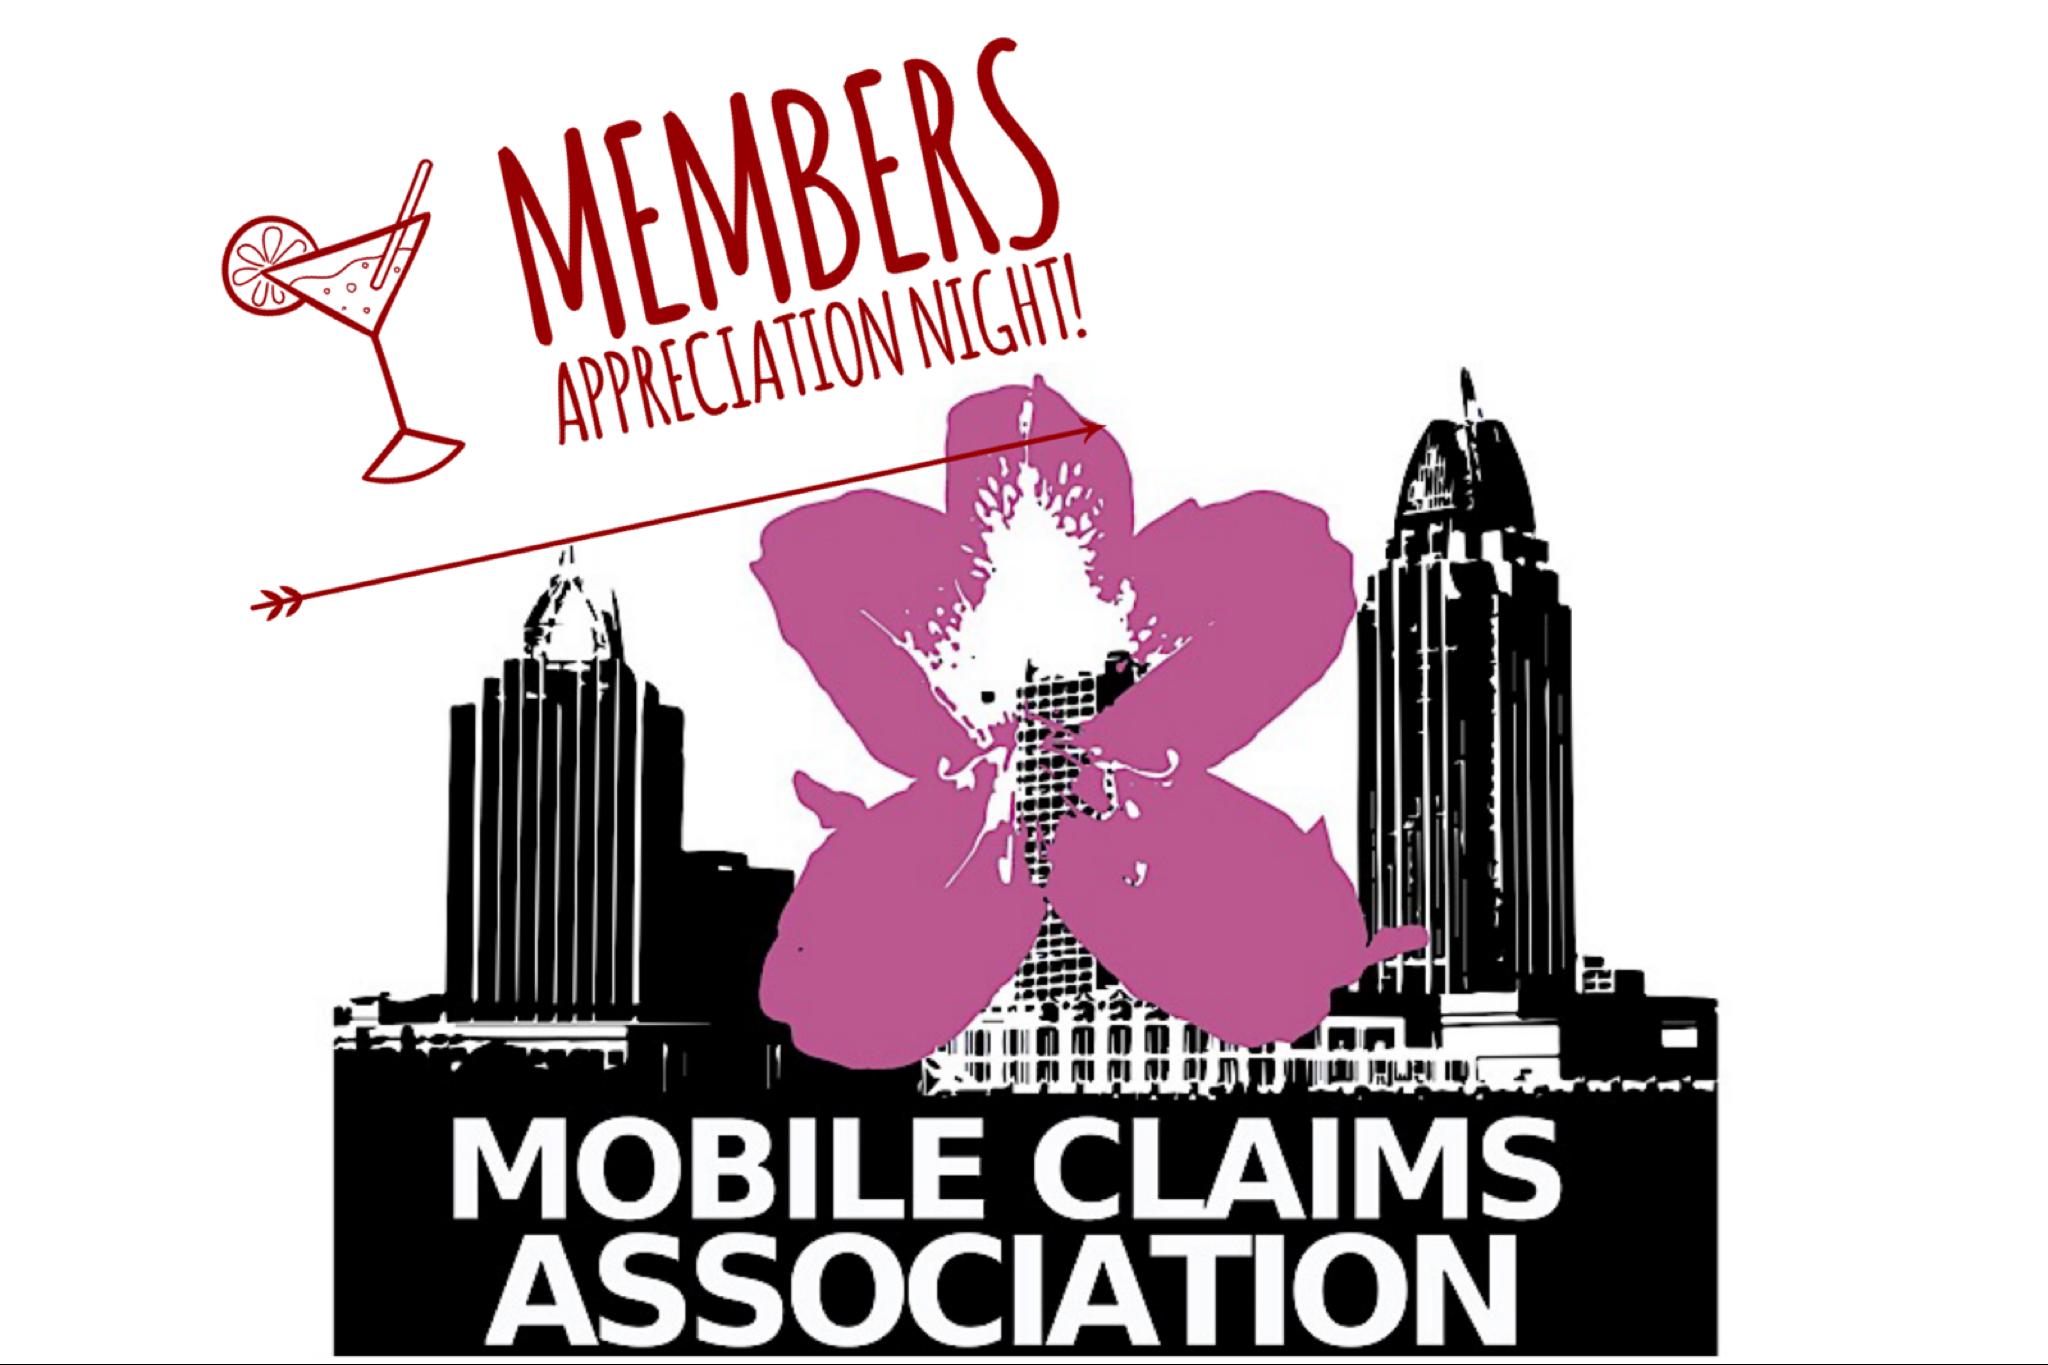 mca_members_appreciation_night_logo_2-1.png